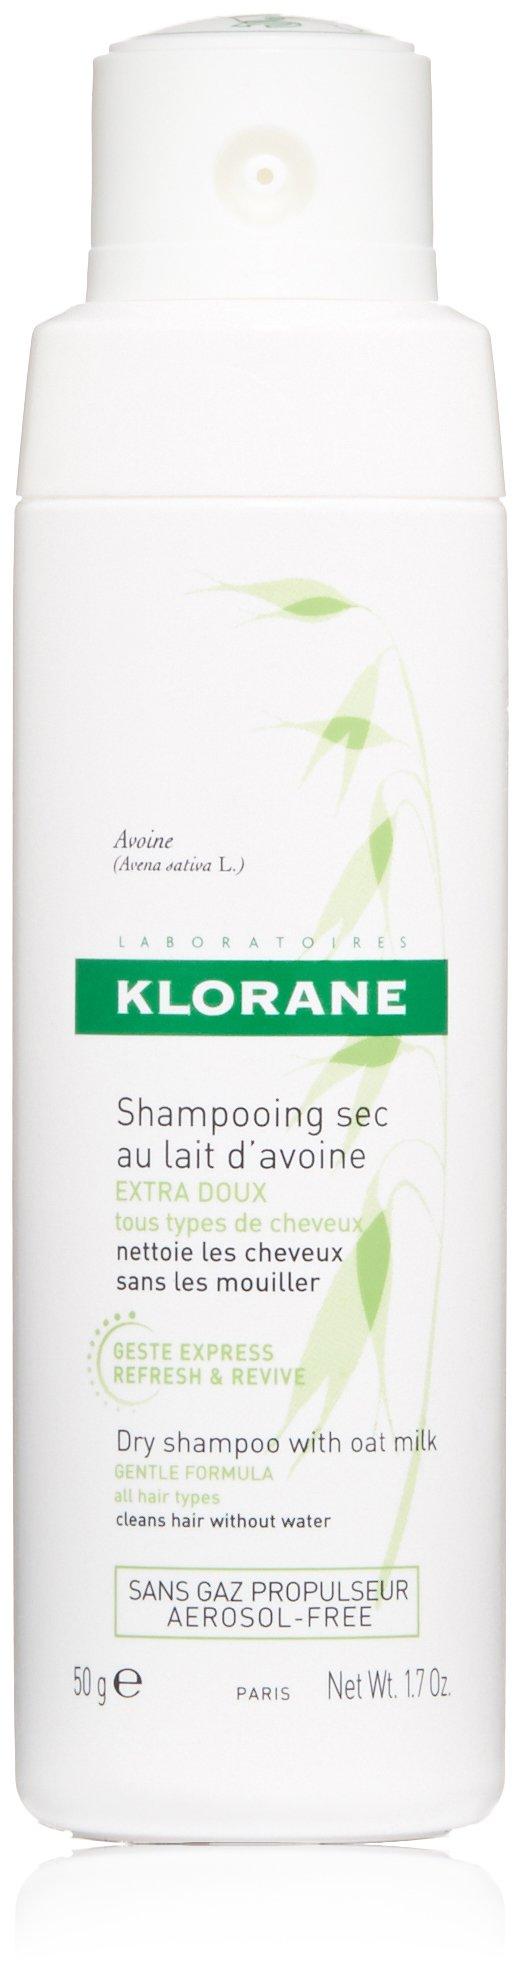 Amazon.com: Klorane Dry Shampoo with Oat Milk - All Hair